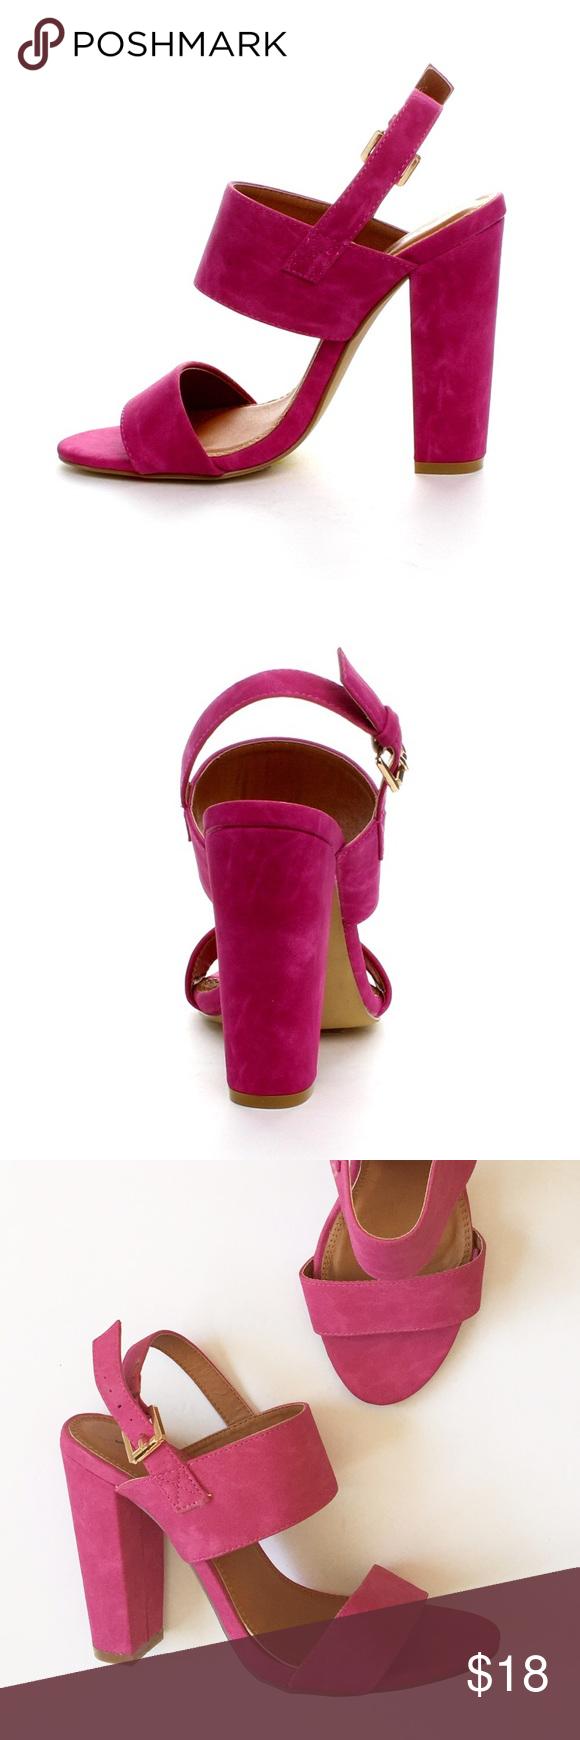 X2B Fuchsia Sandals New! Fuchsia sandals by X2B...an